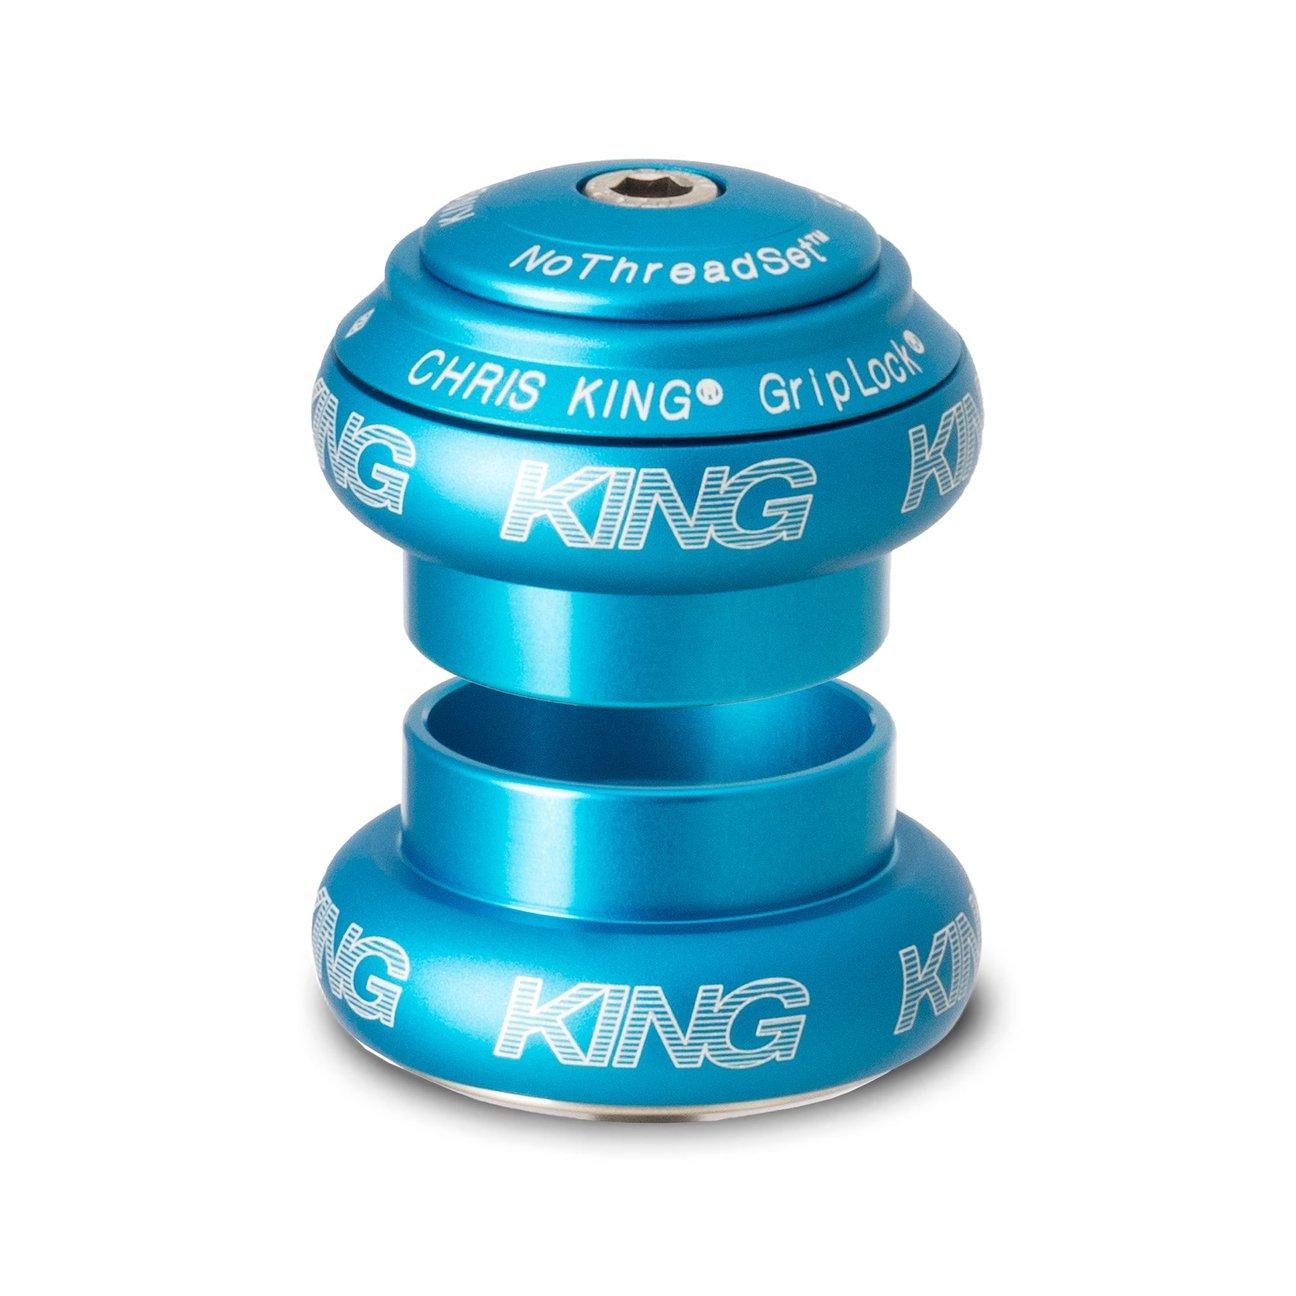 ChrisKing No Threaded 1-1/8 MATTE クリスキング ヘッドセット